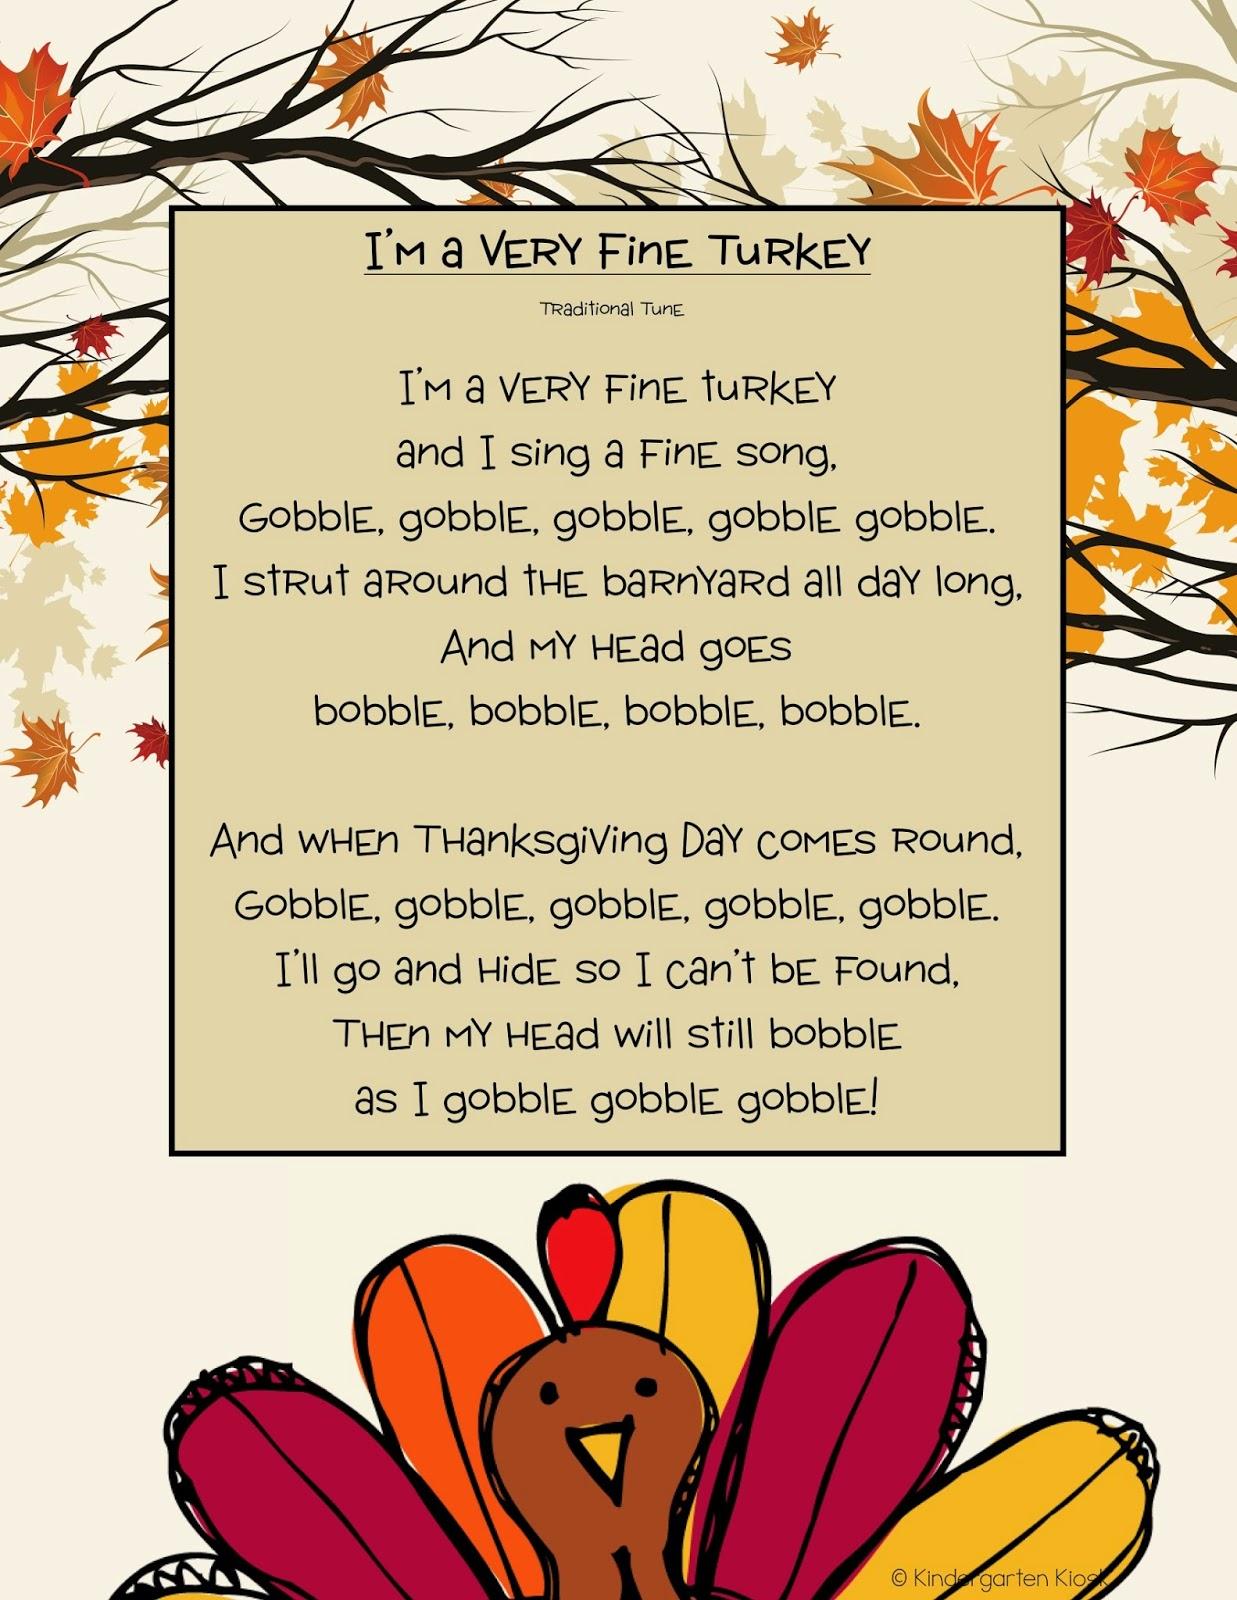 Kindergarten Kiosk Thanksgiving Fun Amp A Freebie